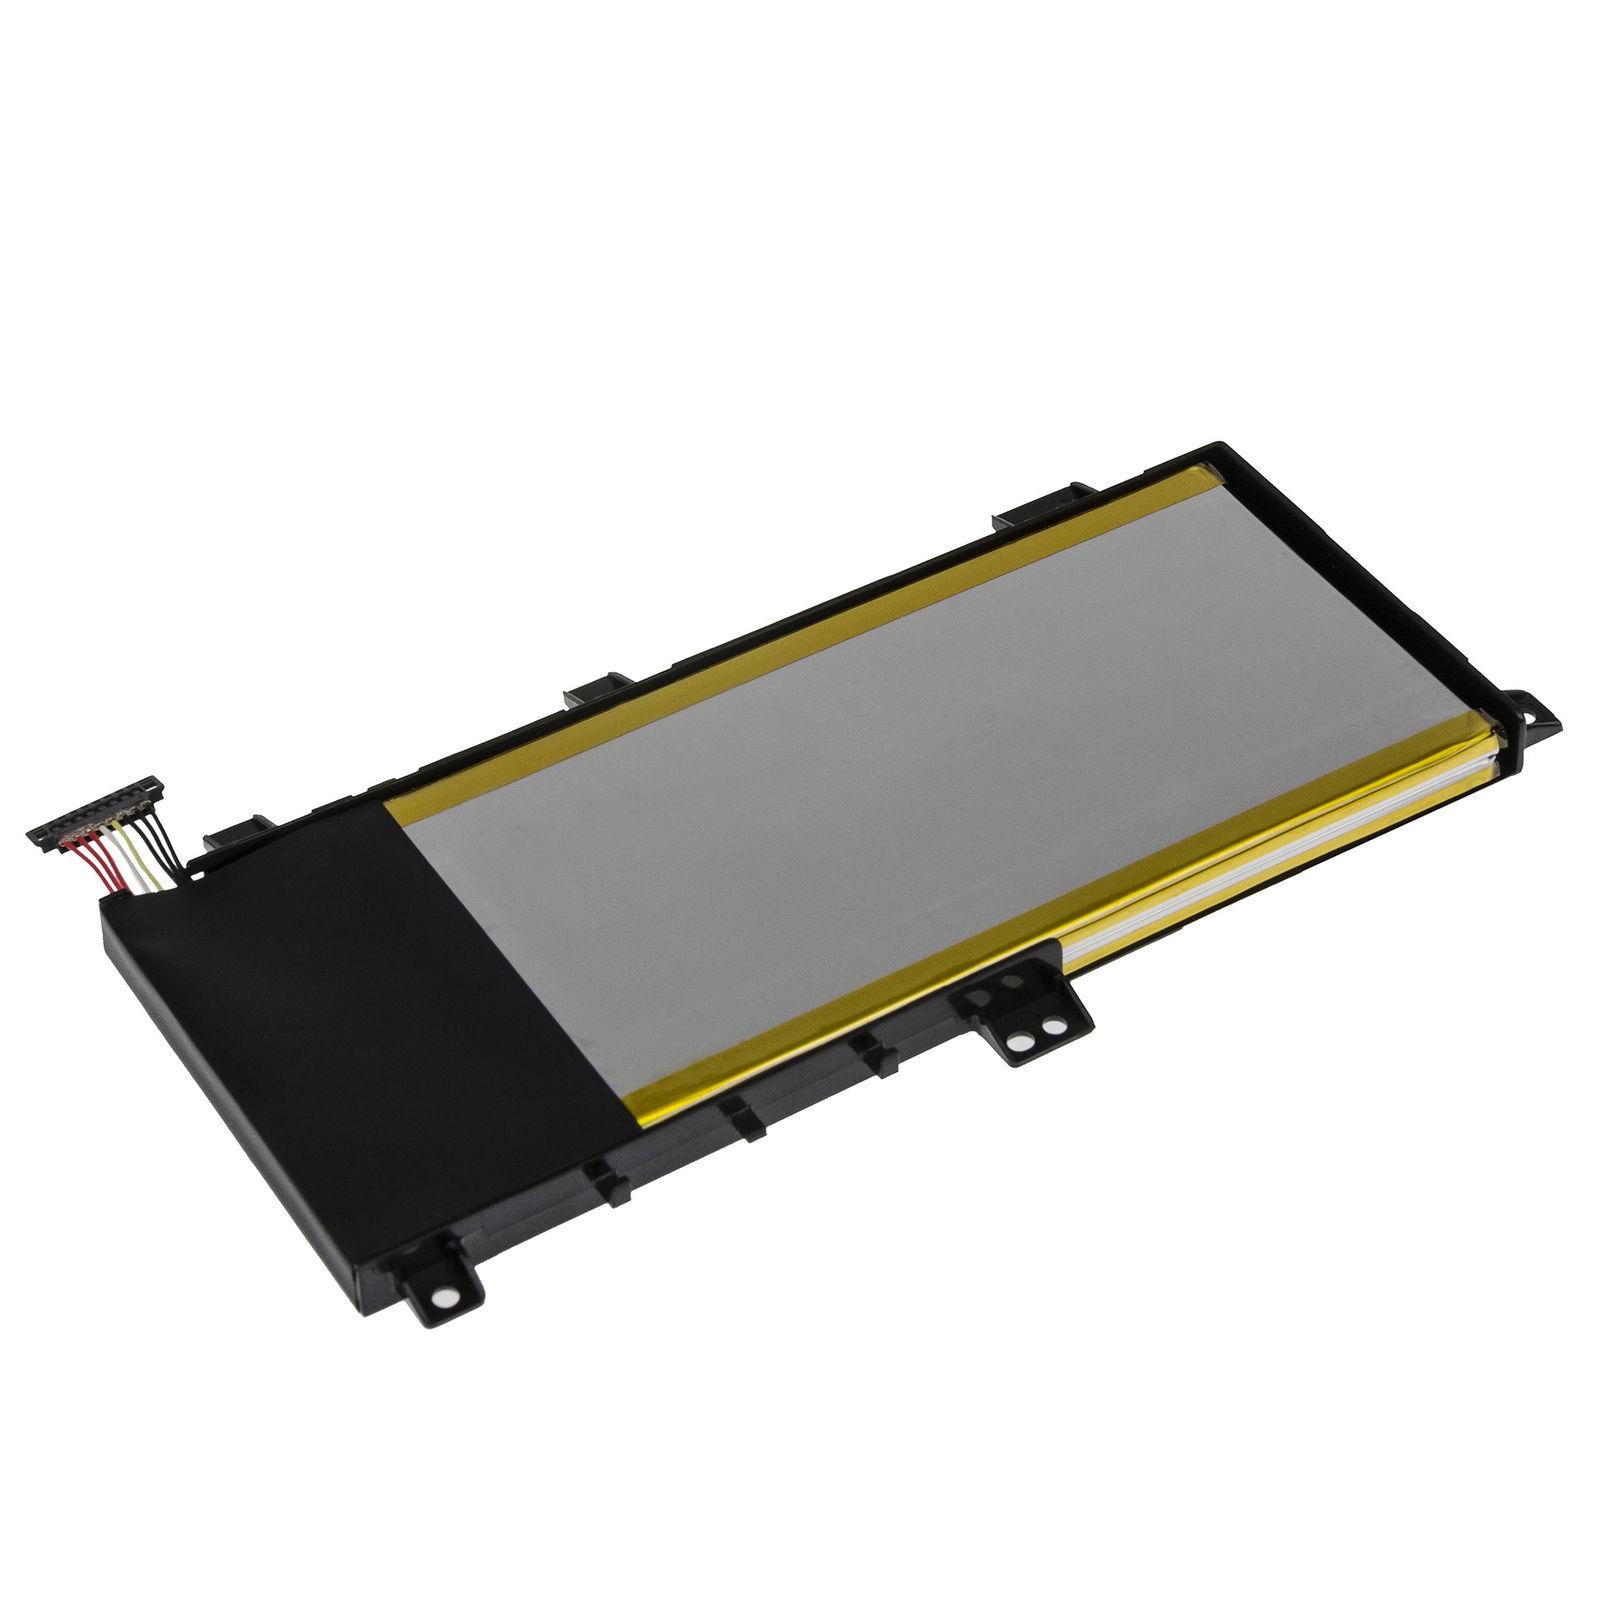 Asus Transformer Book Flip TP550LA-CJ004H TP550LA-CJ025H kompatibelt batterier